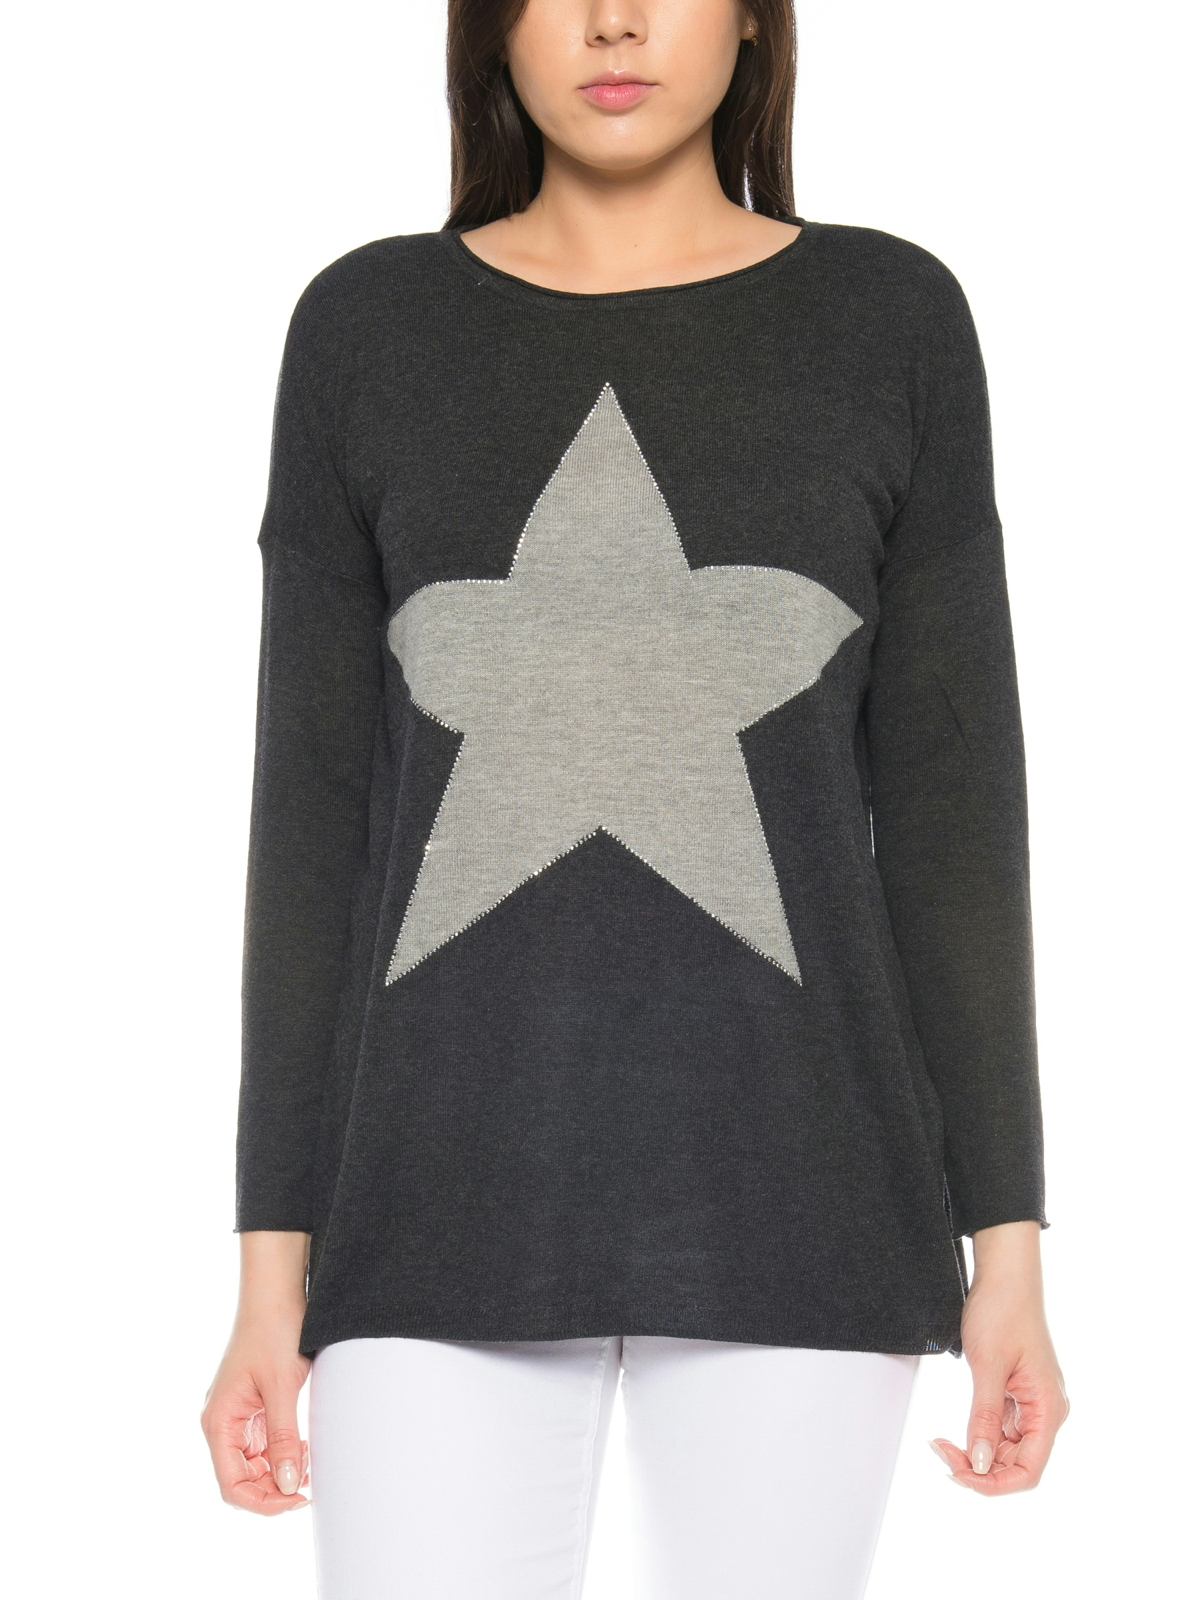 detailed look 9cc81 b538a Only Damen Pullover XS S M L XL Oversize Stern Motiv Shirt ...